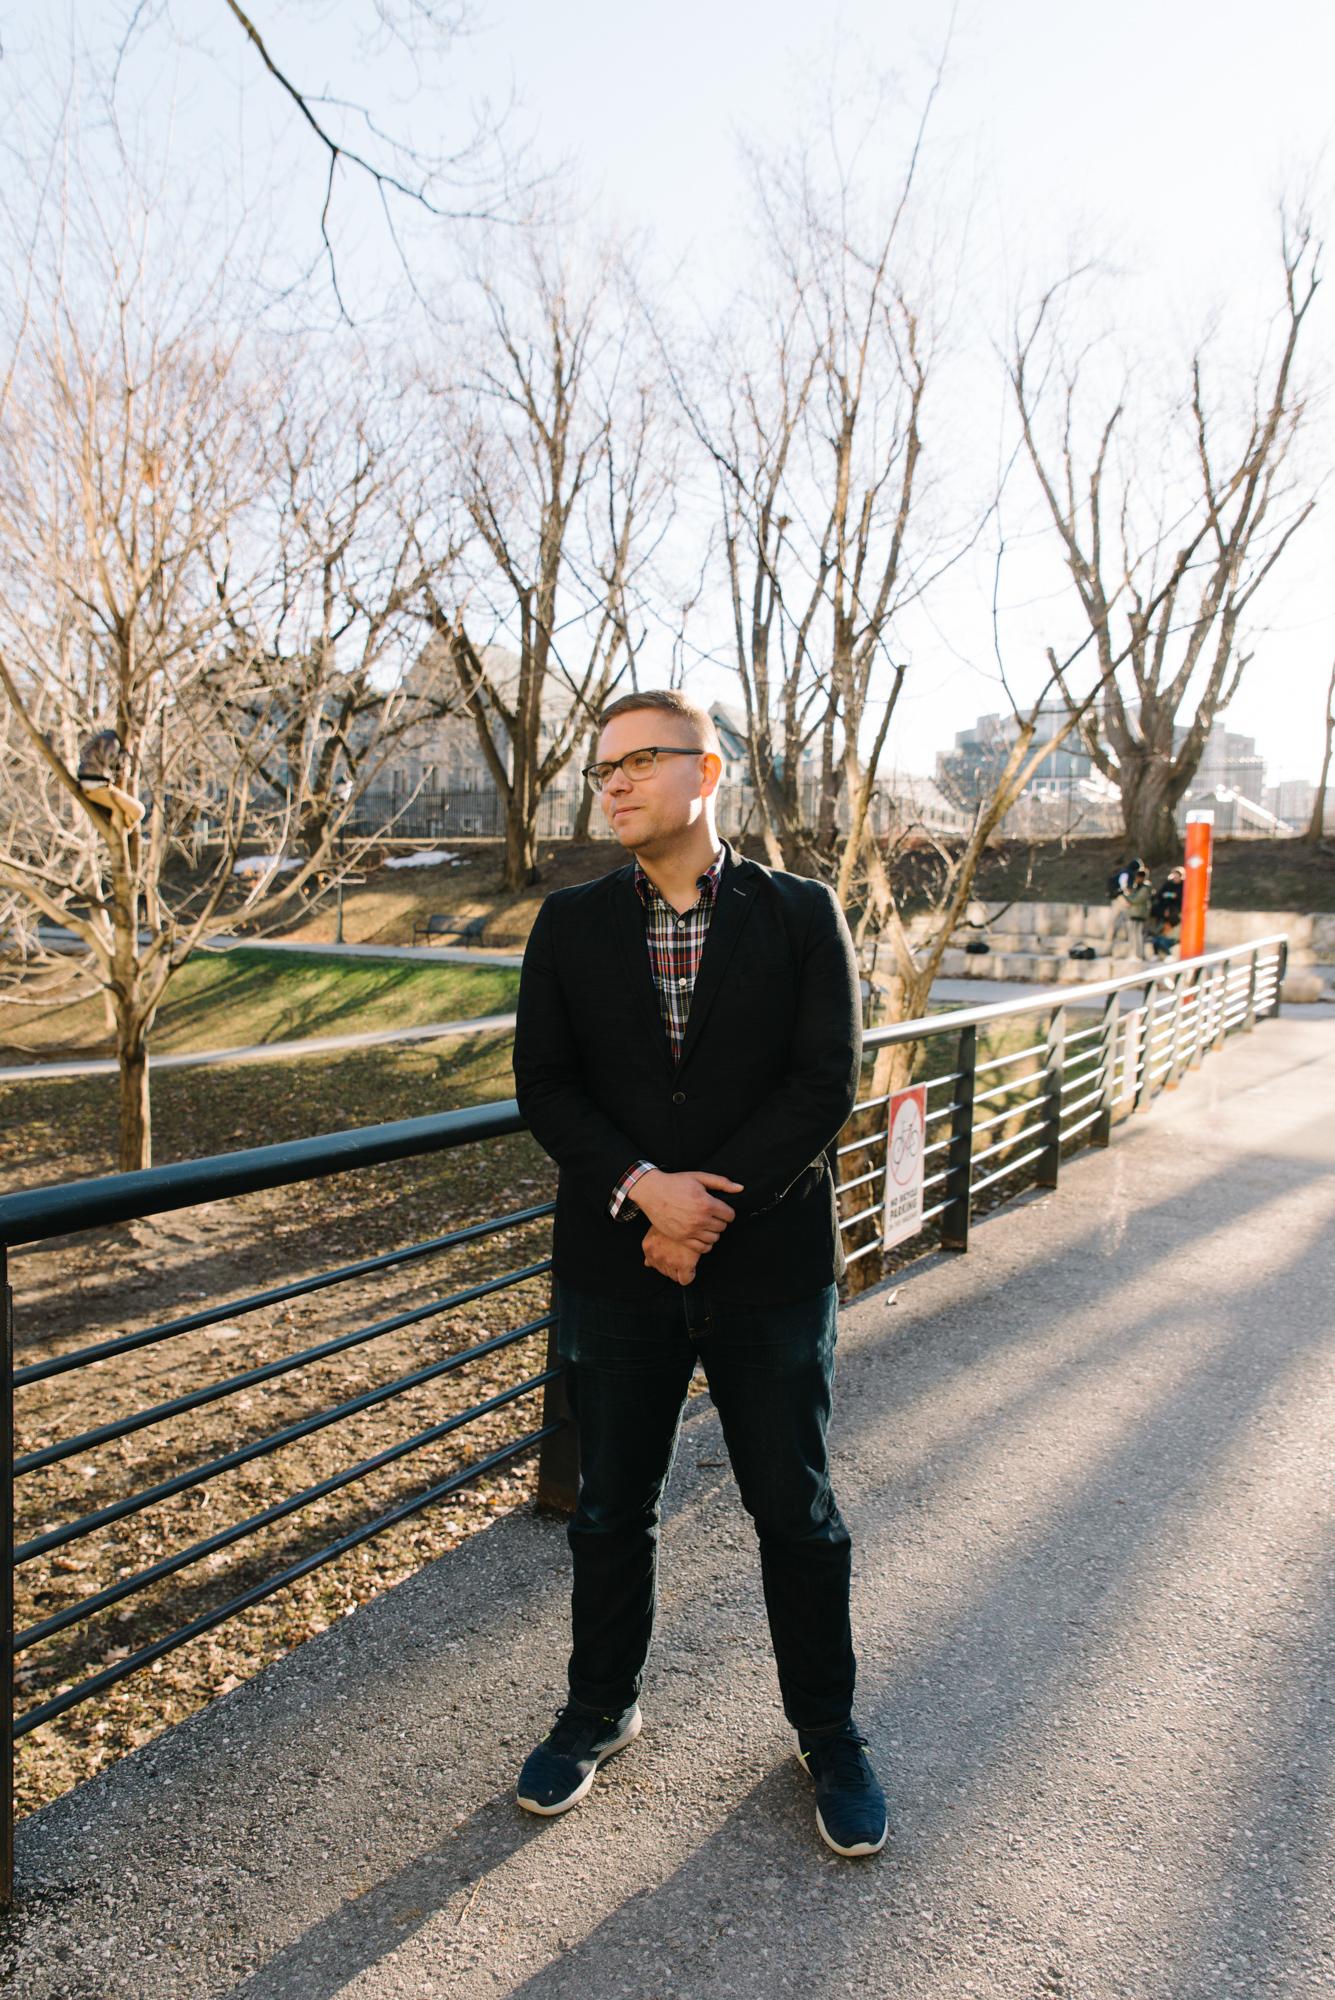 StefEthan-UofT-TRC-TruthandReconciliation-IndigenousIniatives-FacultyofMusic-EliotBirtton-TorontoPortraitPhotographer-13.JPG